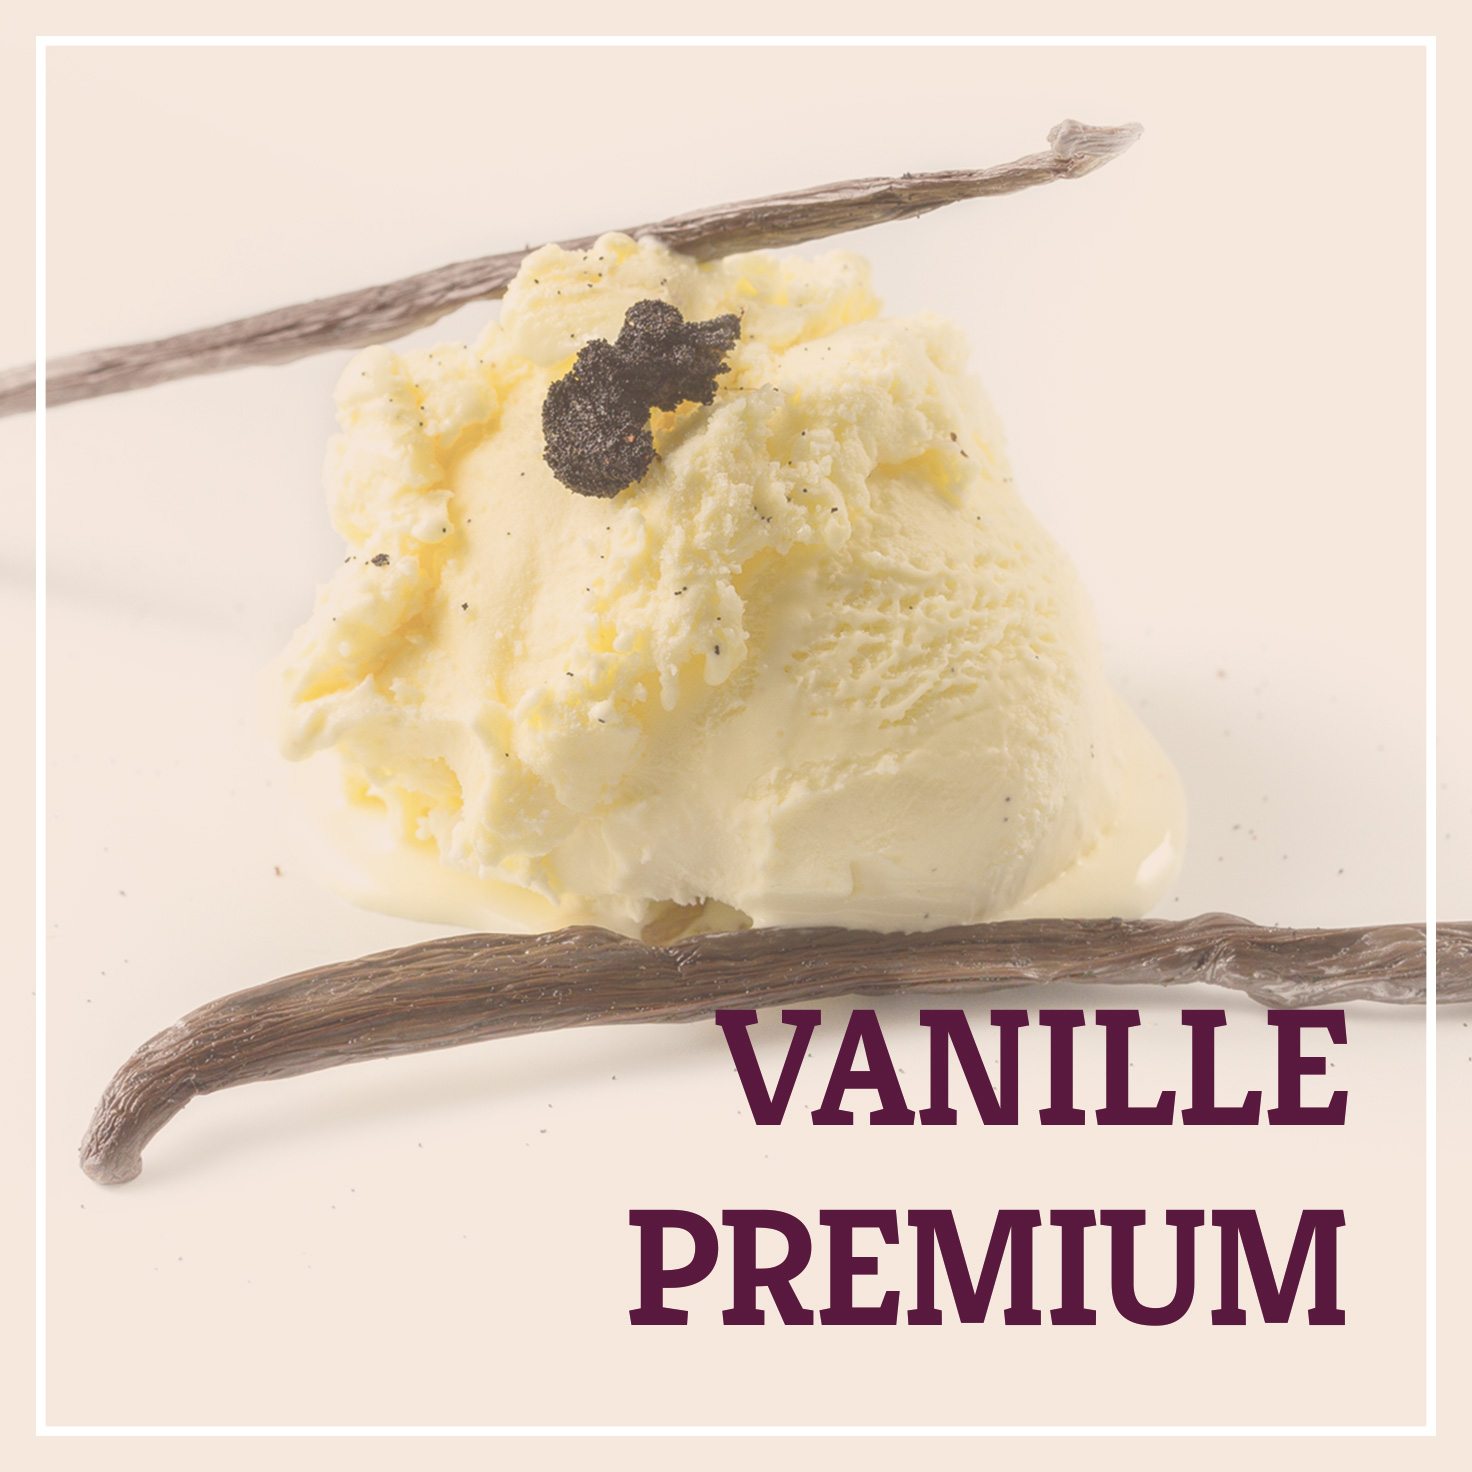 Heiss & Süß - Vanille-Premium